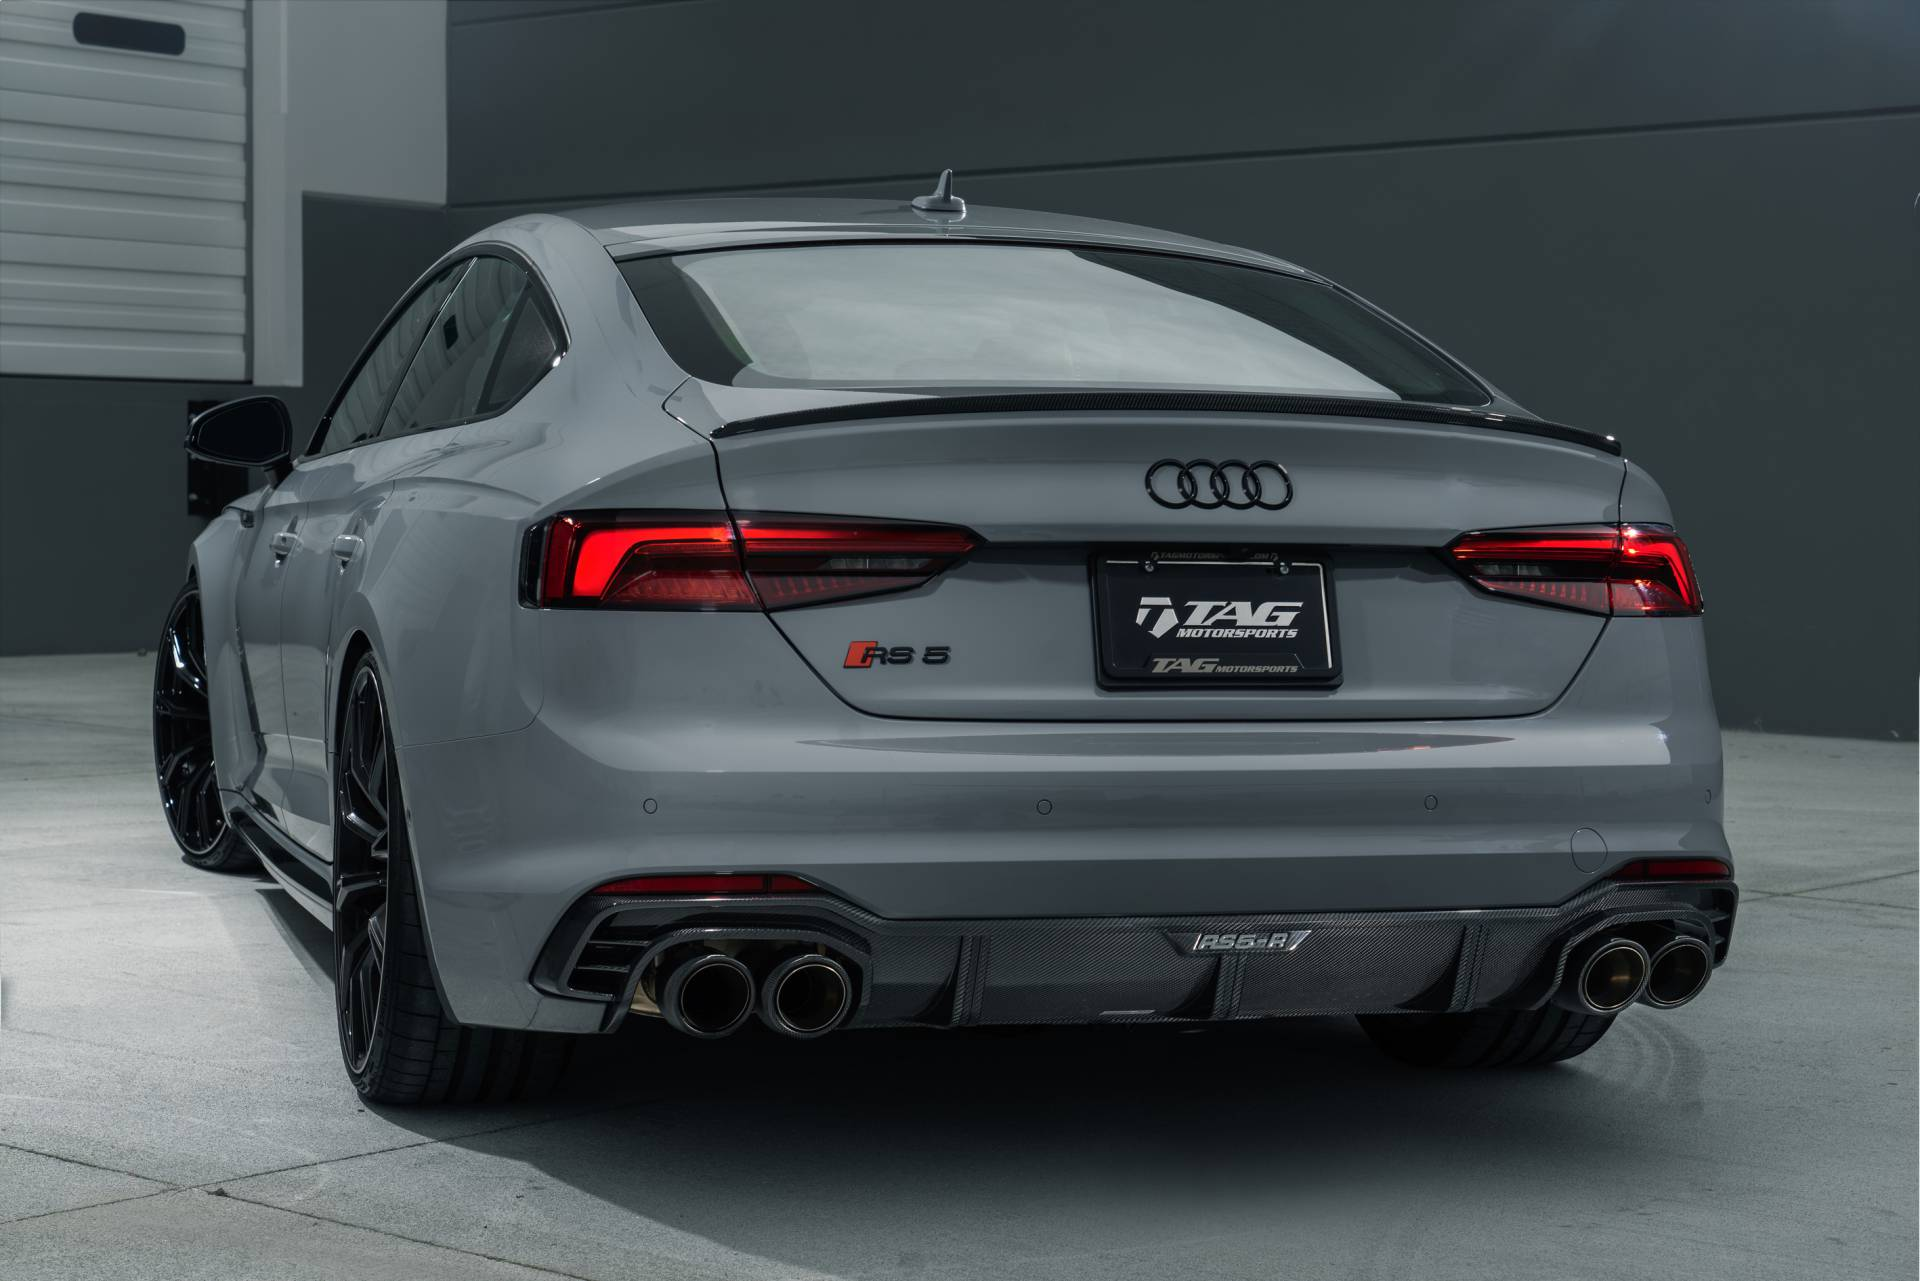 Audi R TDI Fourtitudecom - Audi r10